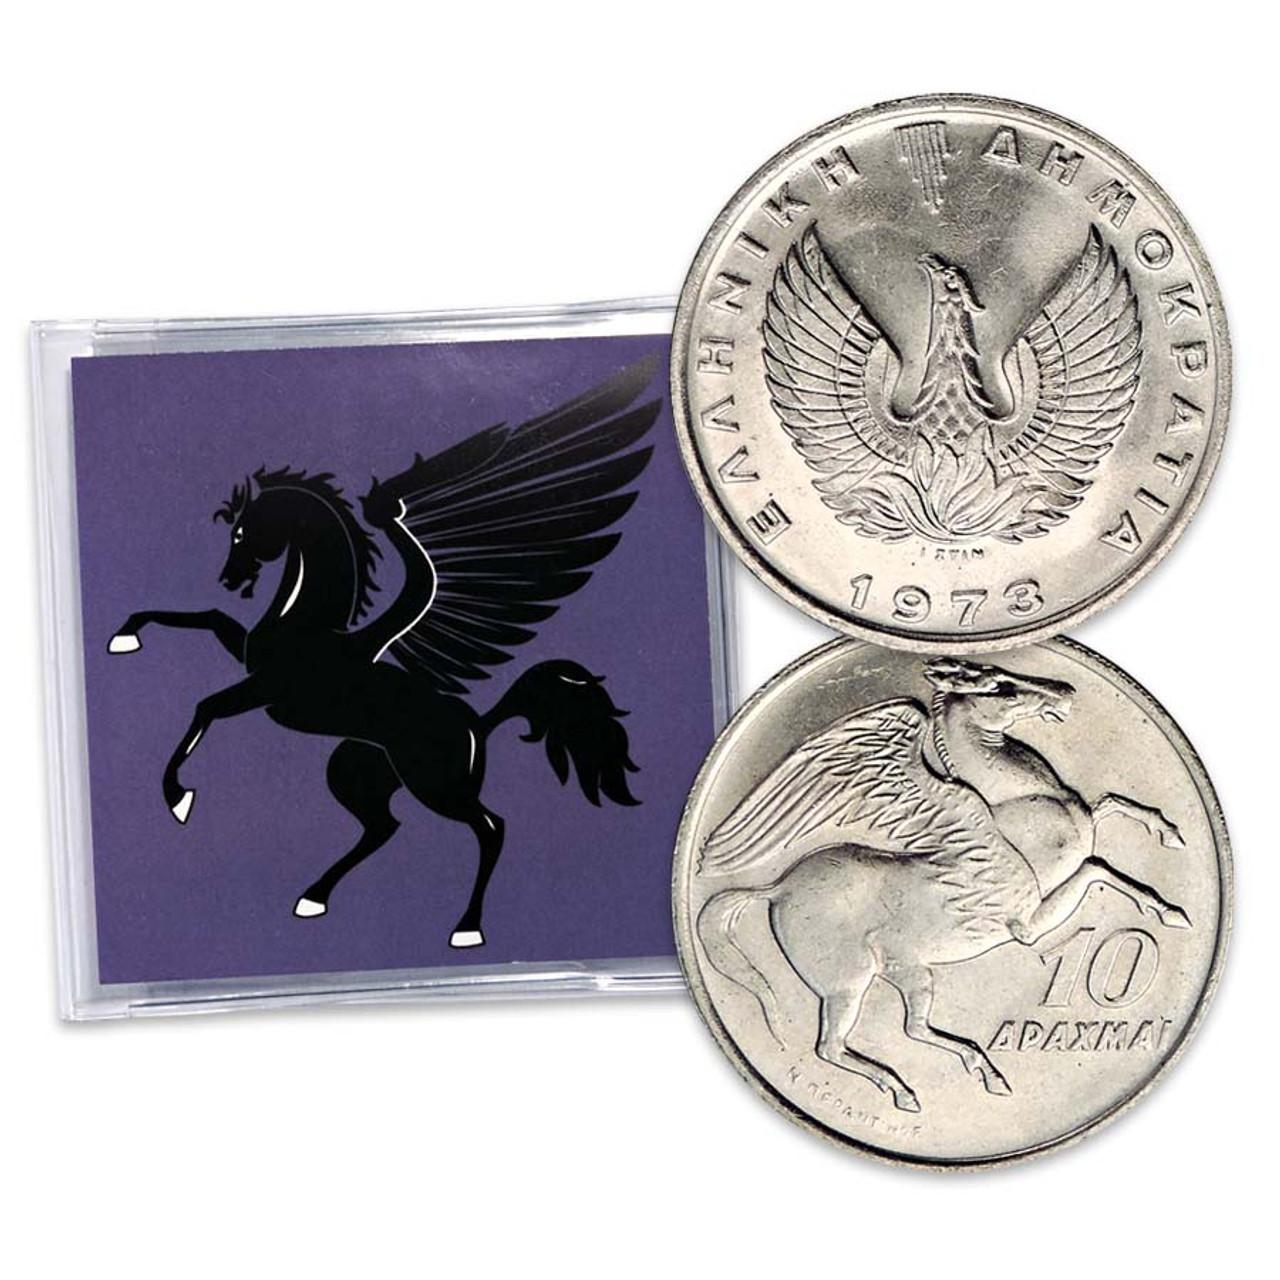 Greece 1973 Pegasus 10 Drachmai Uncirculated